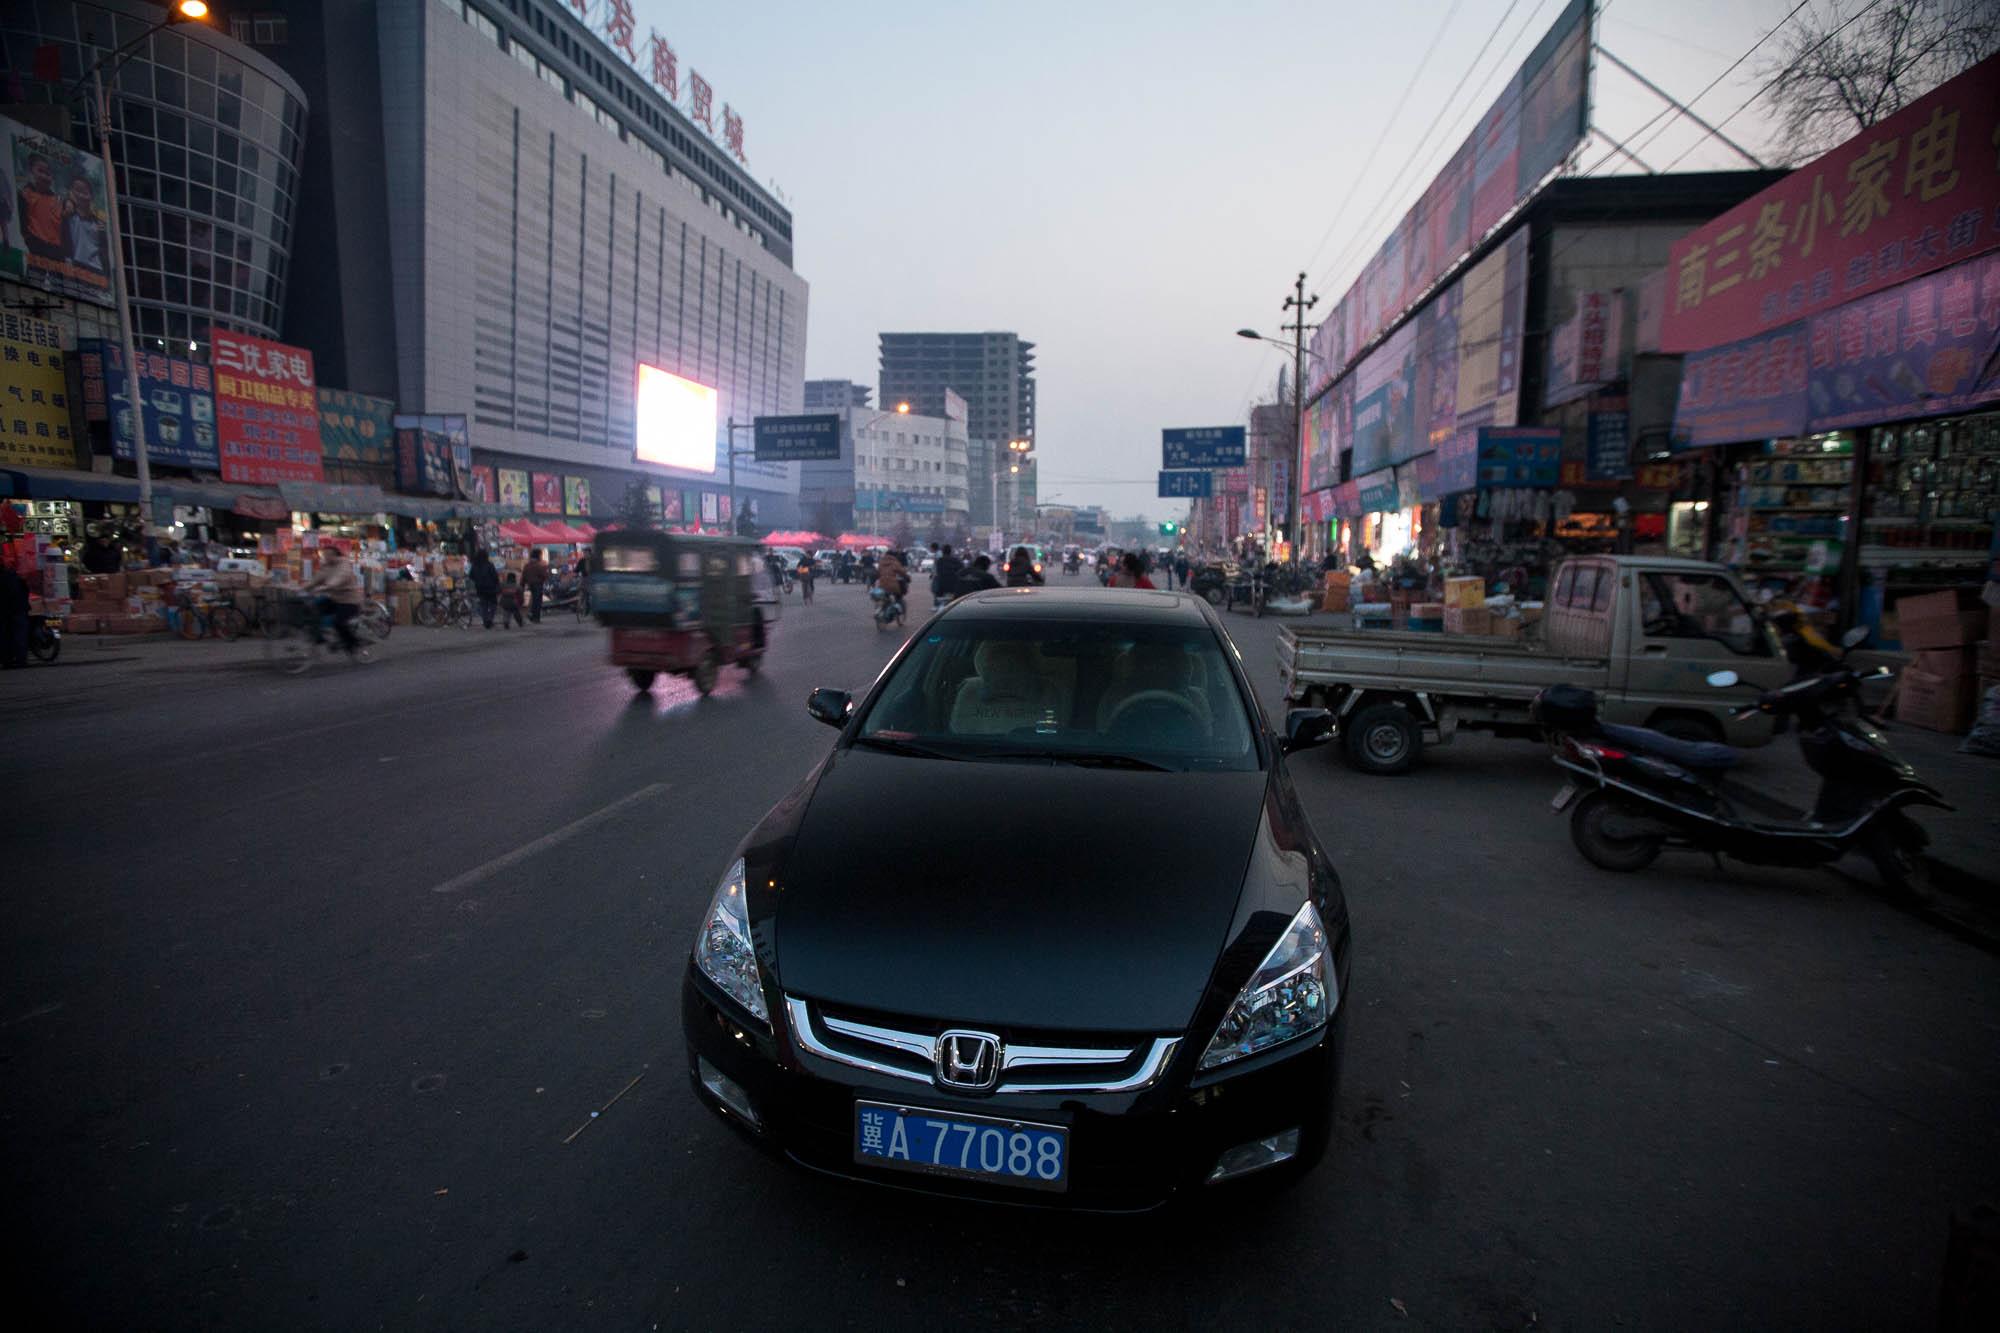 street scene in Shijiazhuang